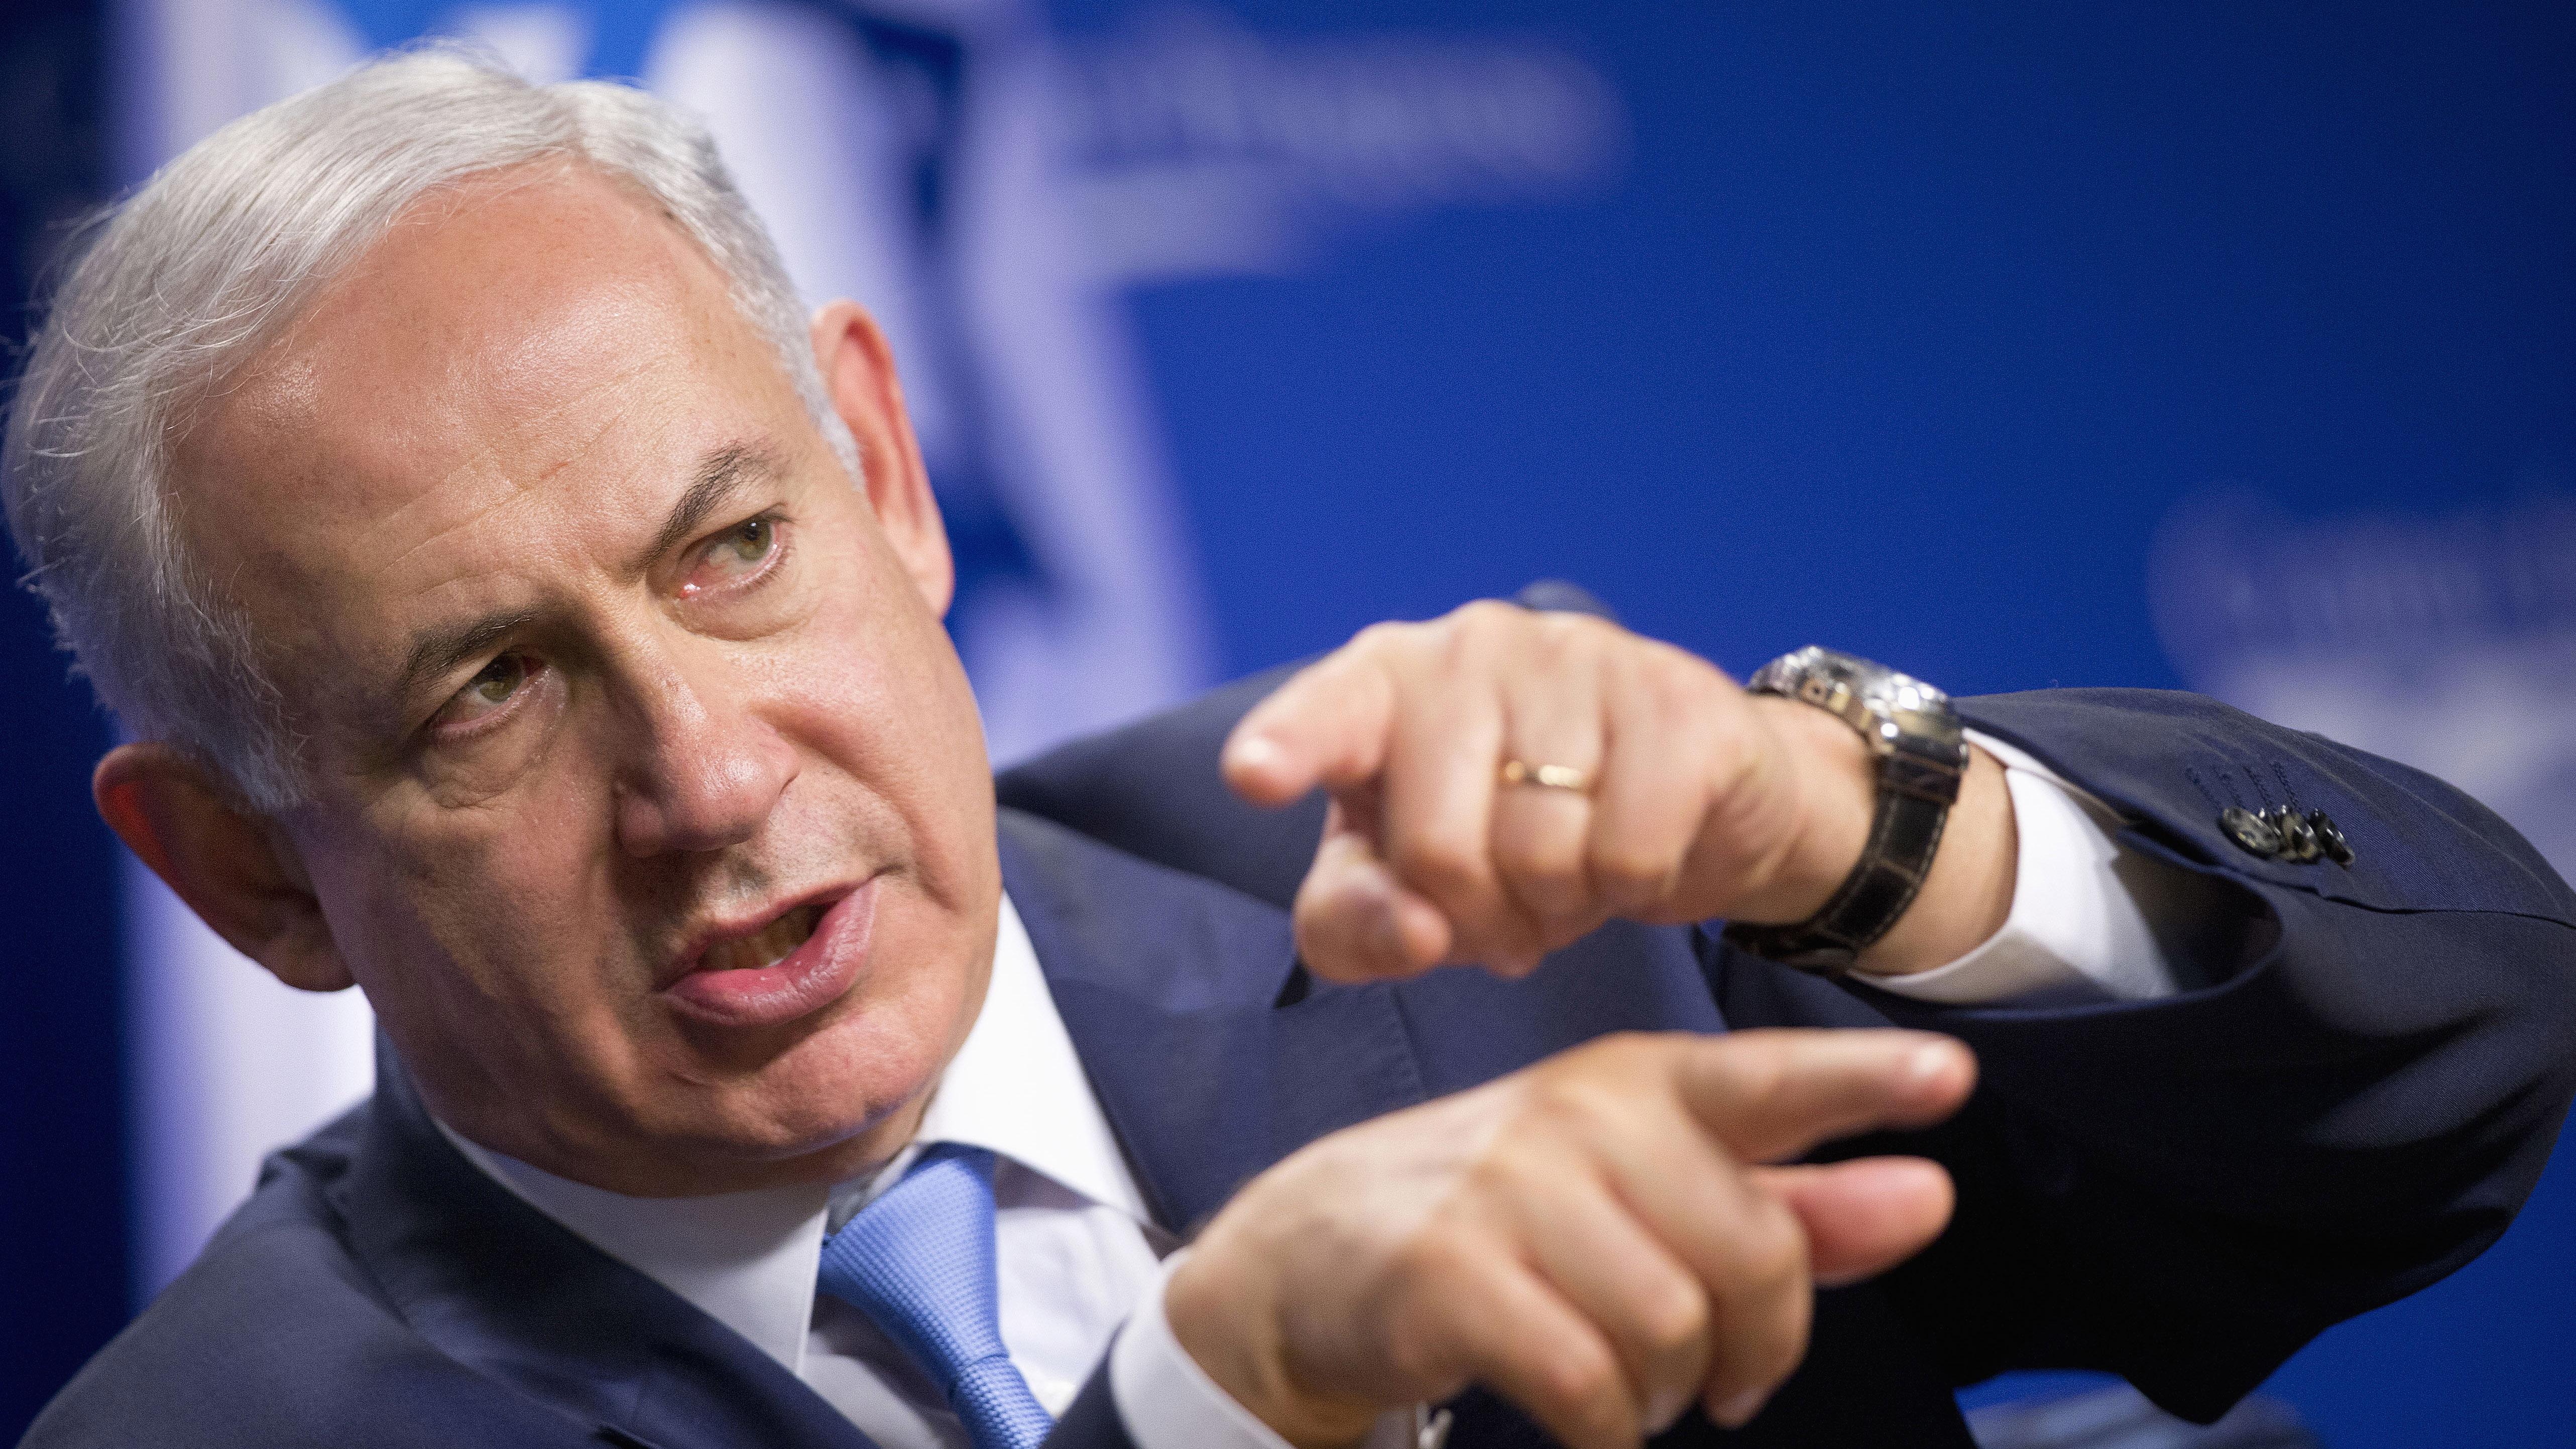 File Photo -- Israeli Prime Minister Benjamin Netanyahu speaks at the Center for American Progress, Tuesday, Nov. 10, 2015, in Washington.